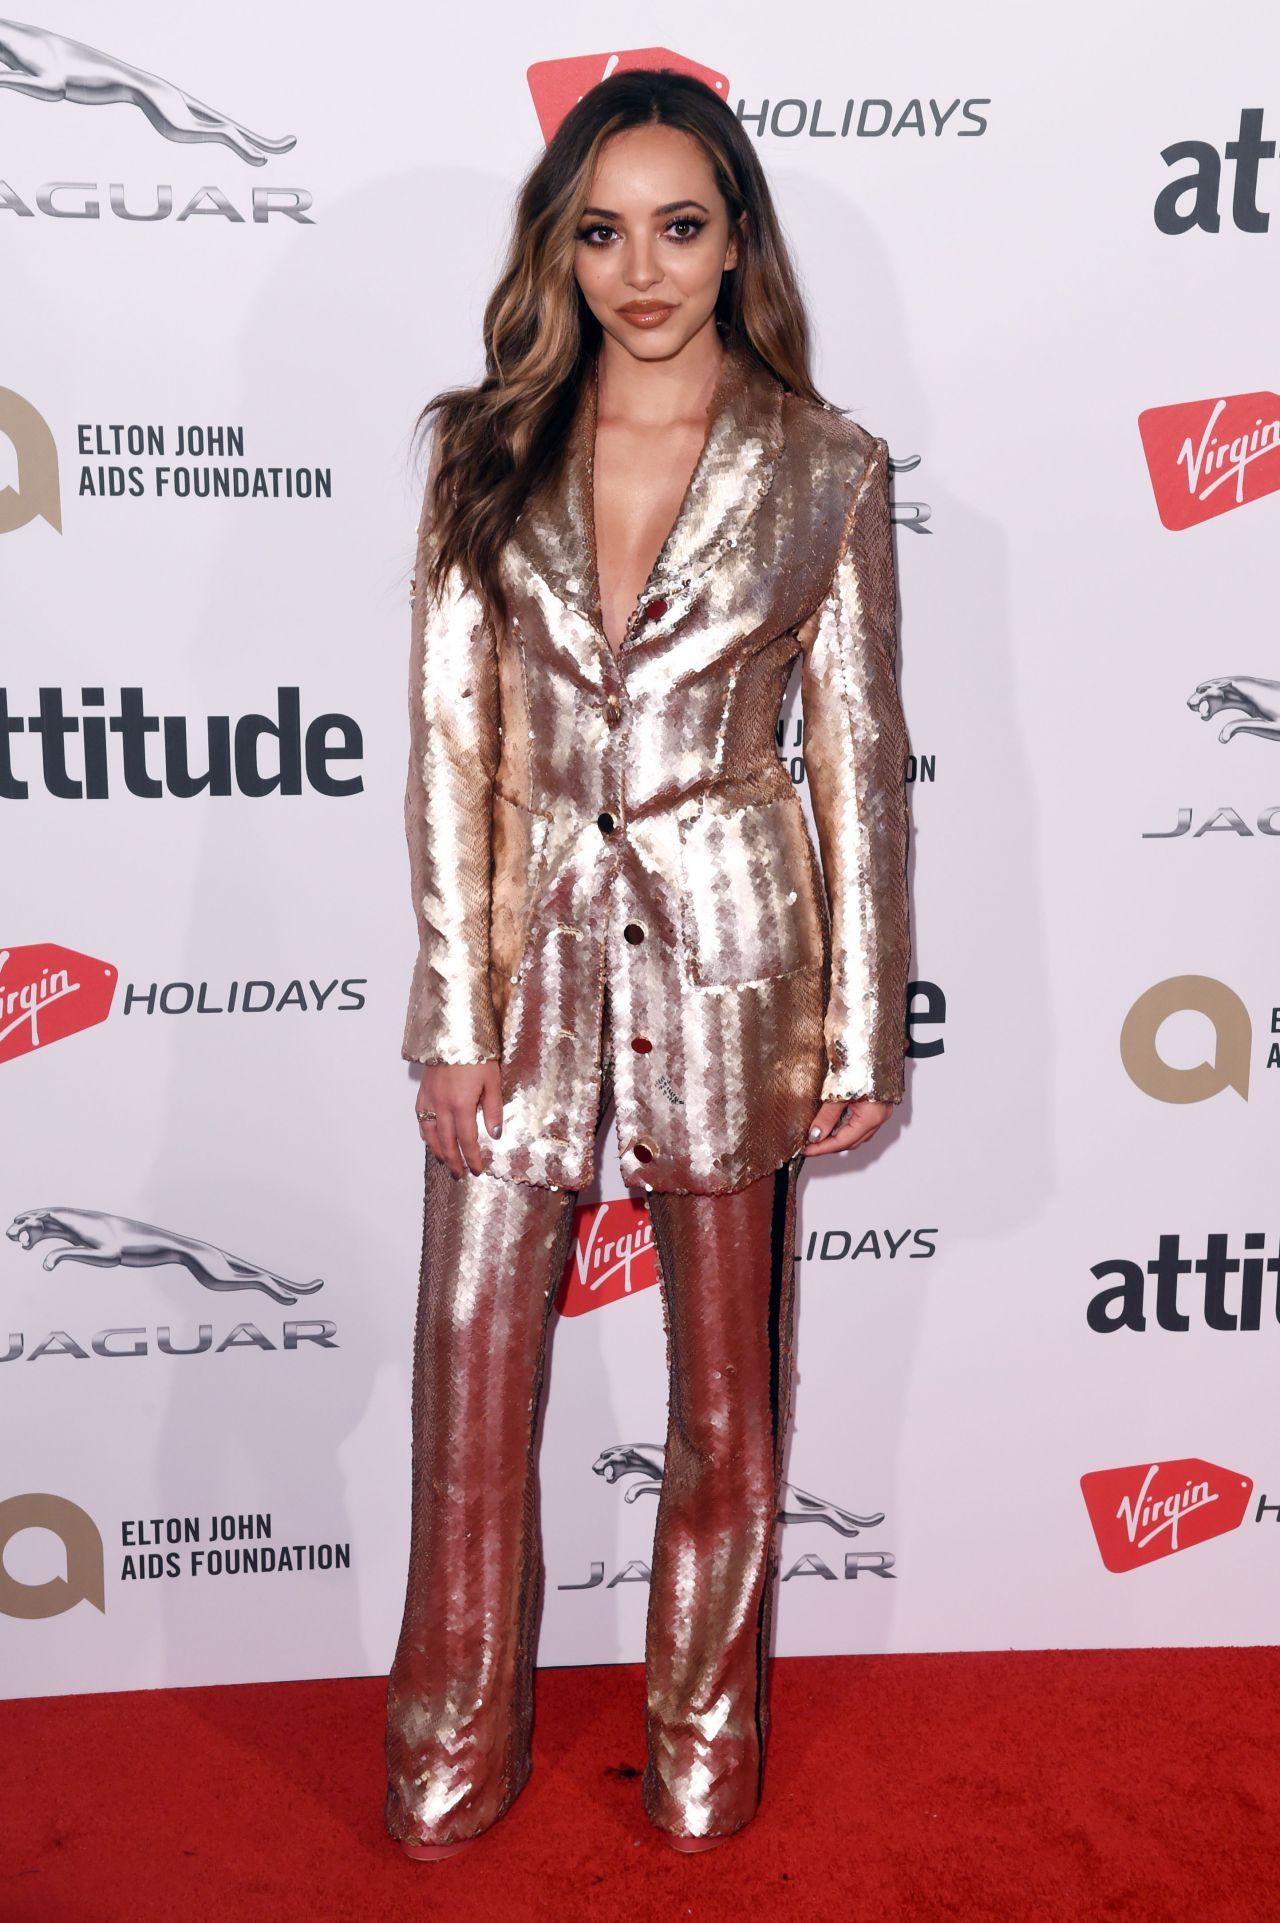 Jade Thirlwall - Attitude Magazine Pride Awards 2017 in London 10/12/2017